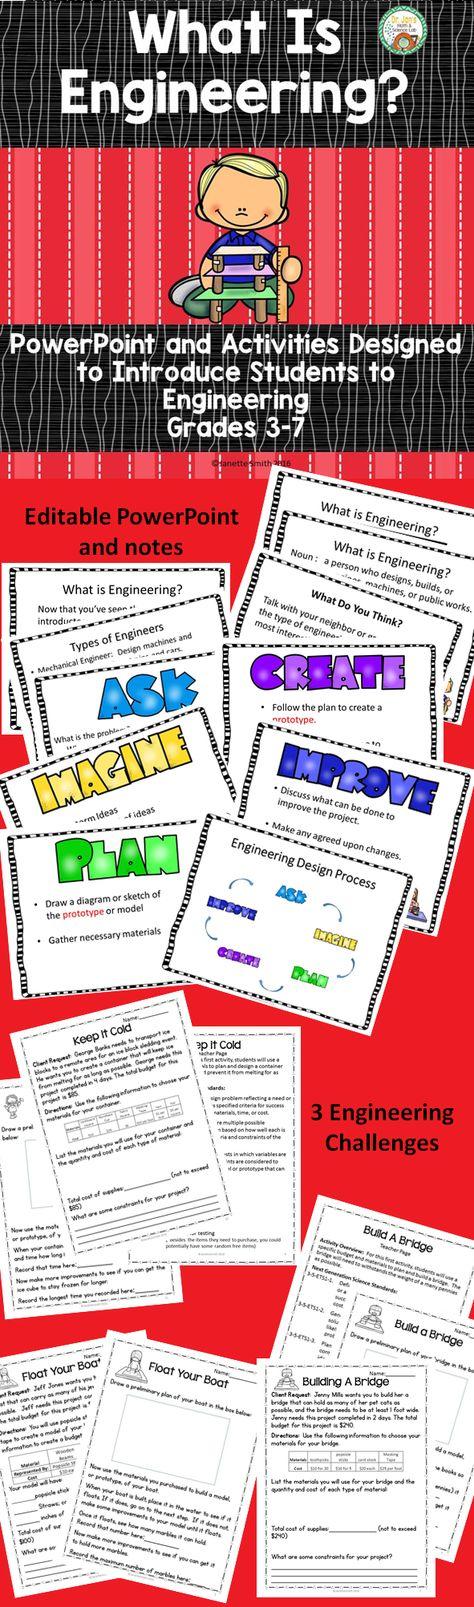 List of Pinterest engineering design challenge ideas & engineering